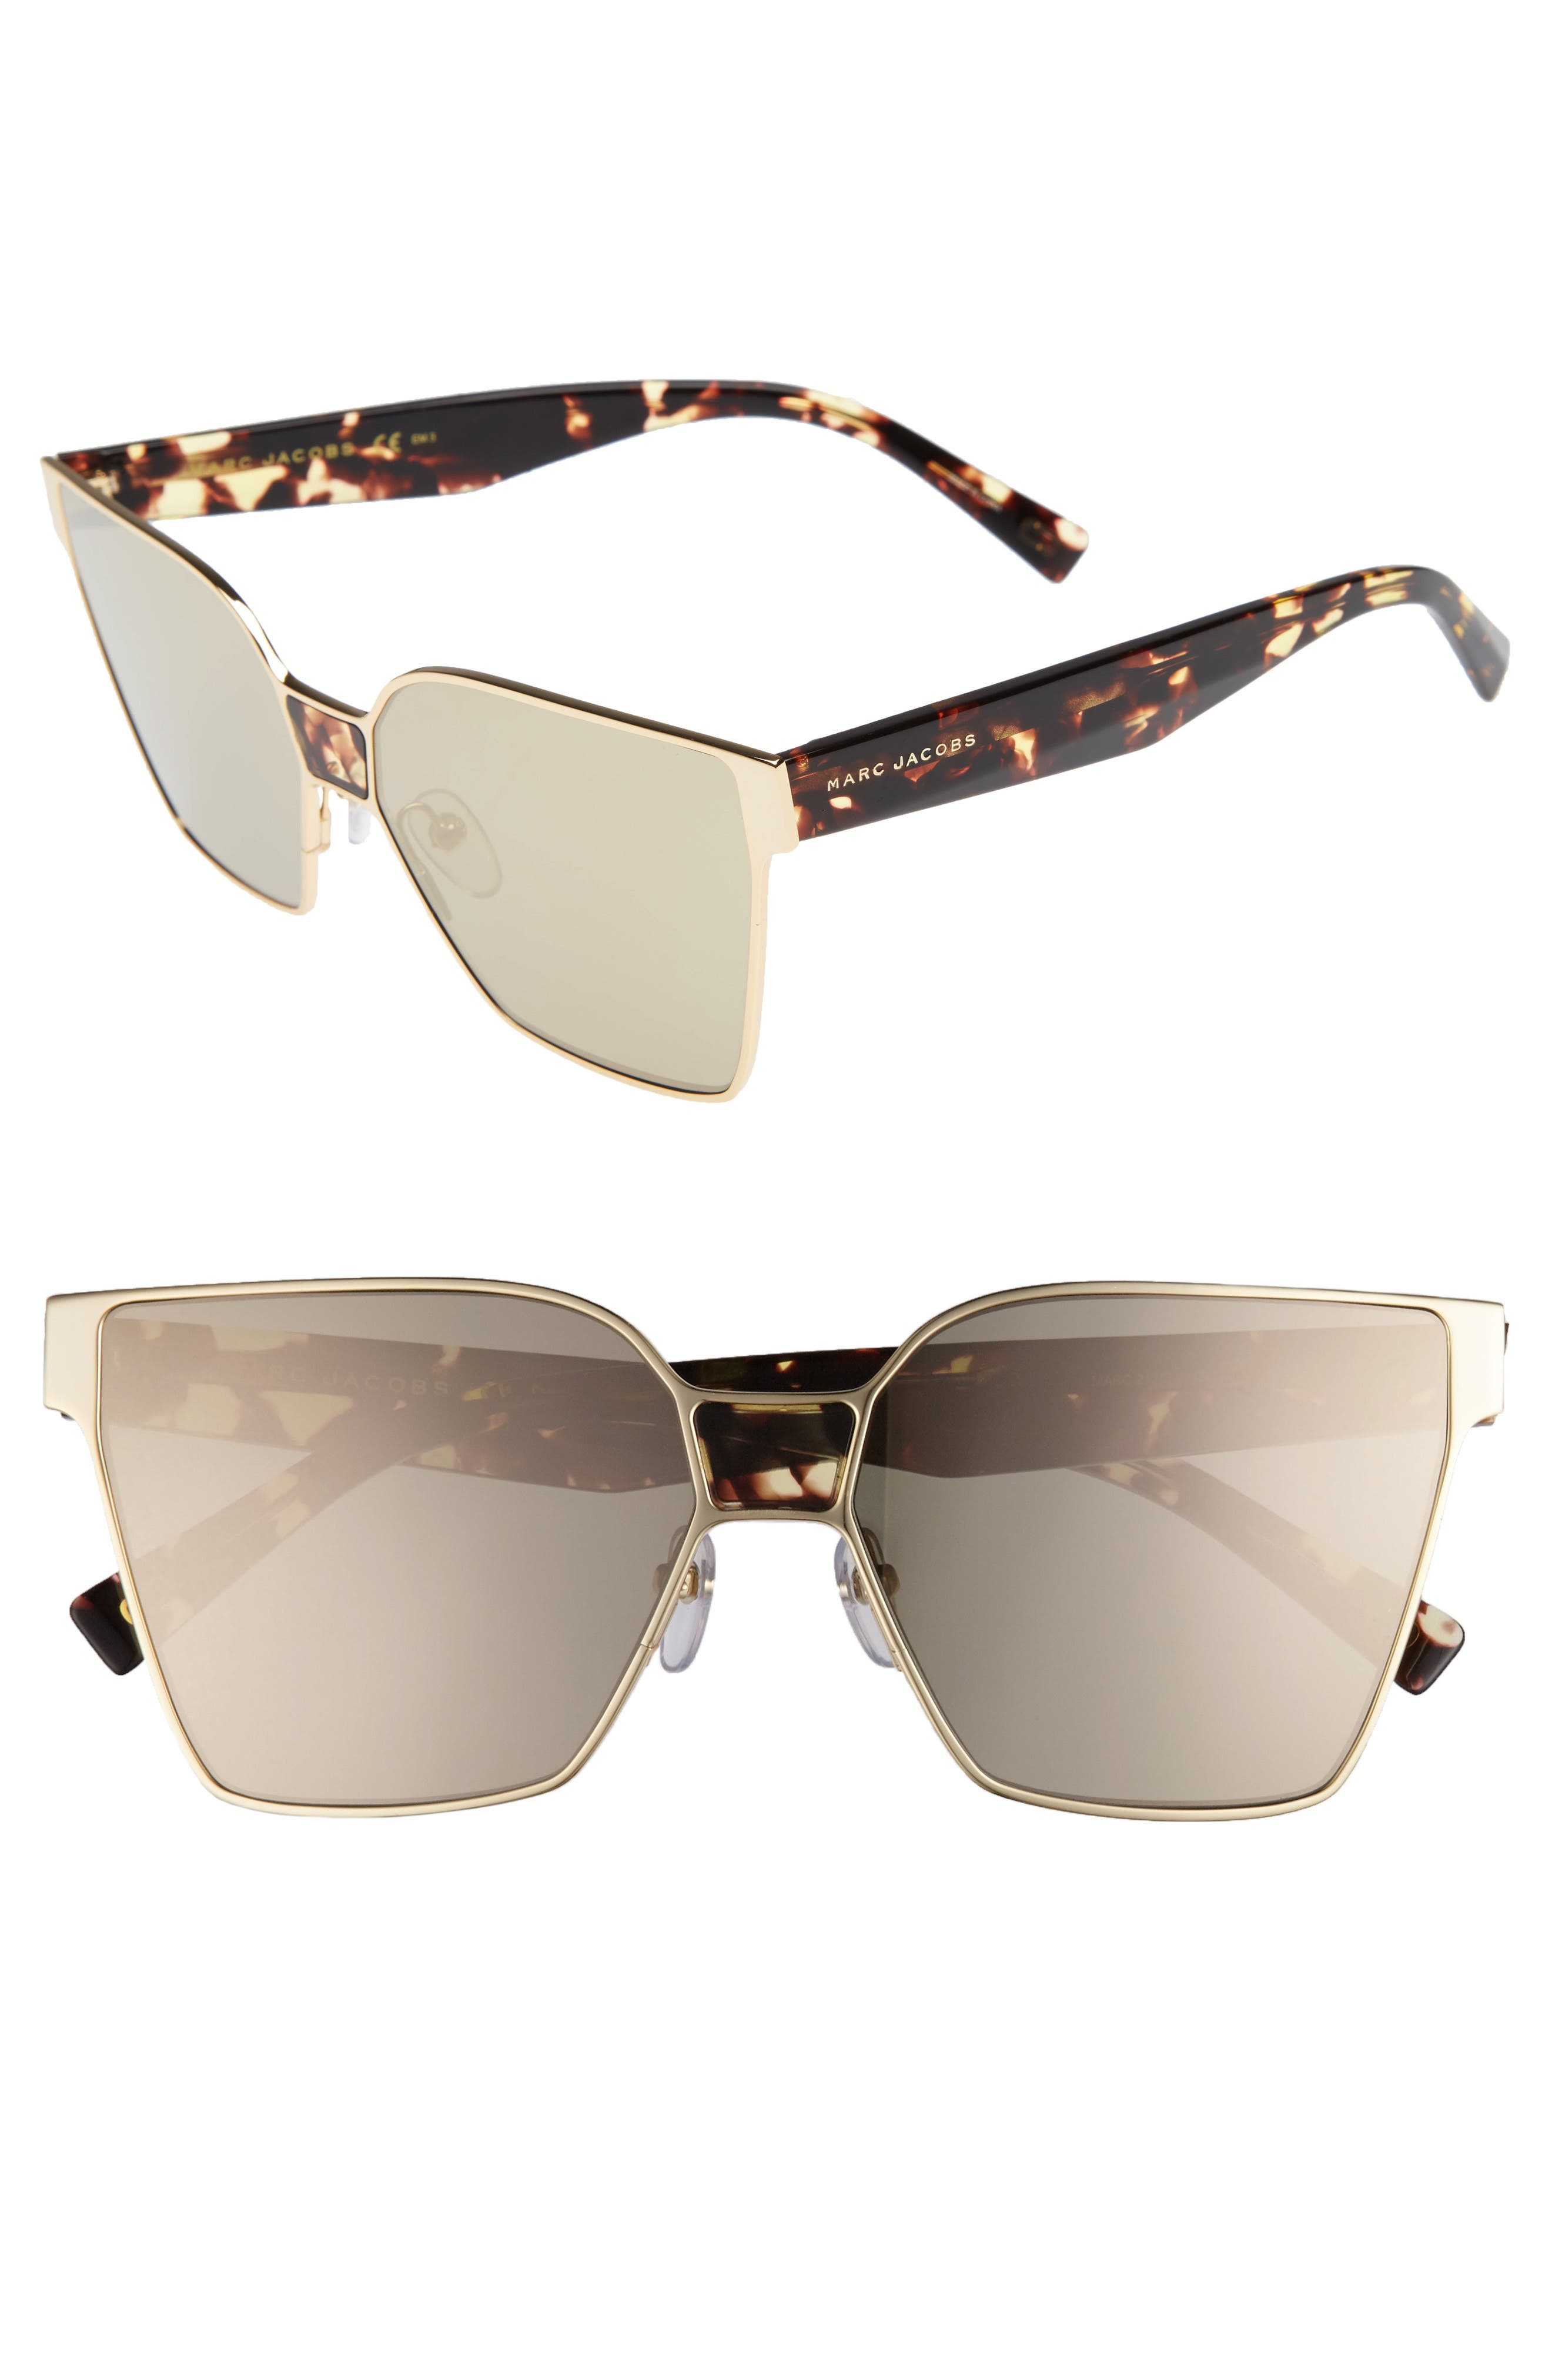 60mm Square Sunglasses,                             Main thumbnail 1, color,